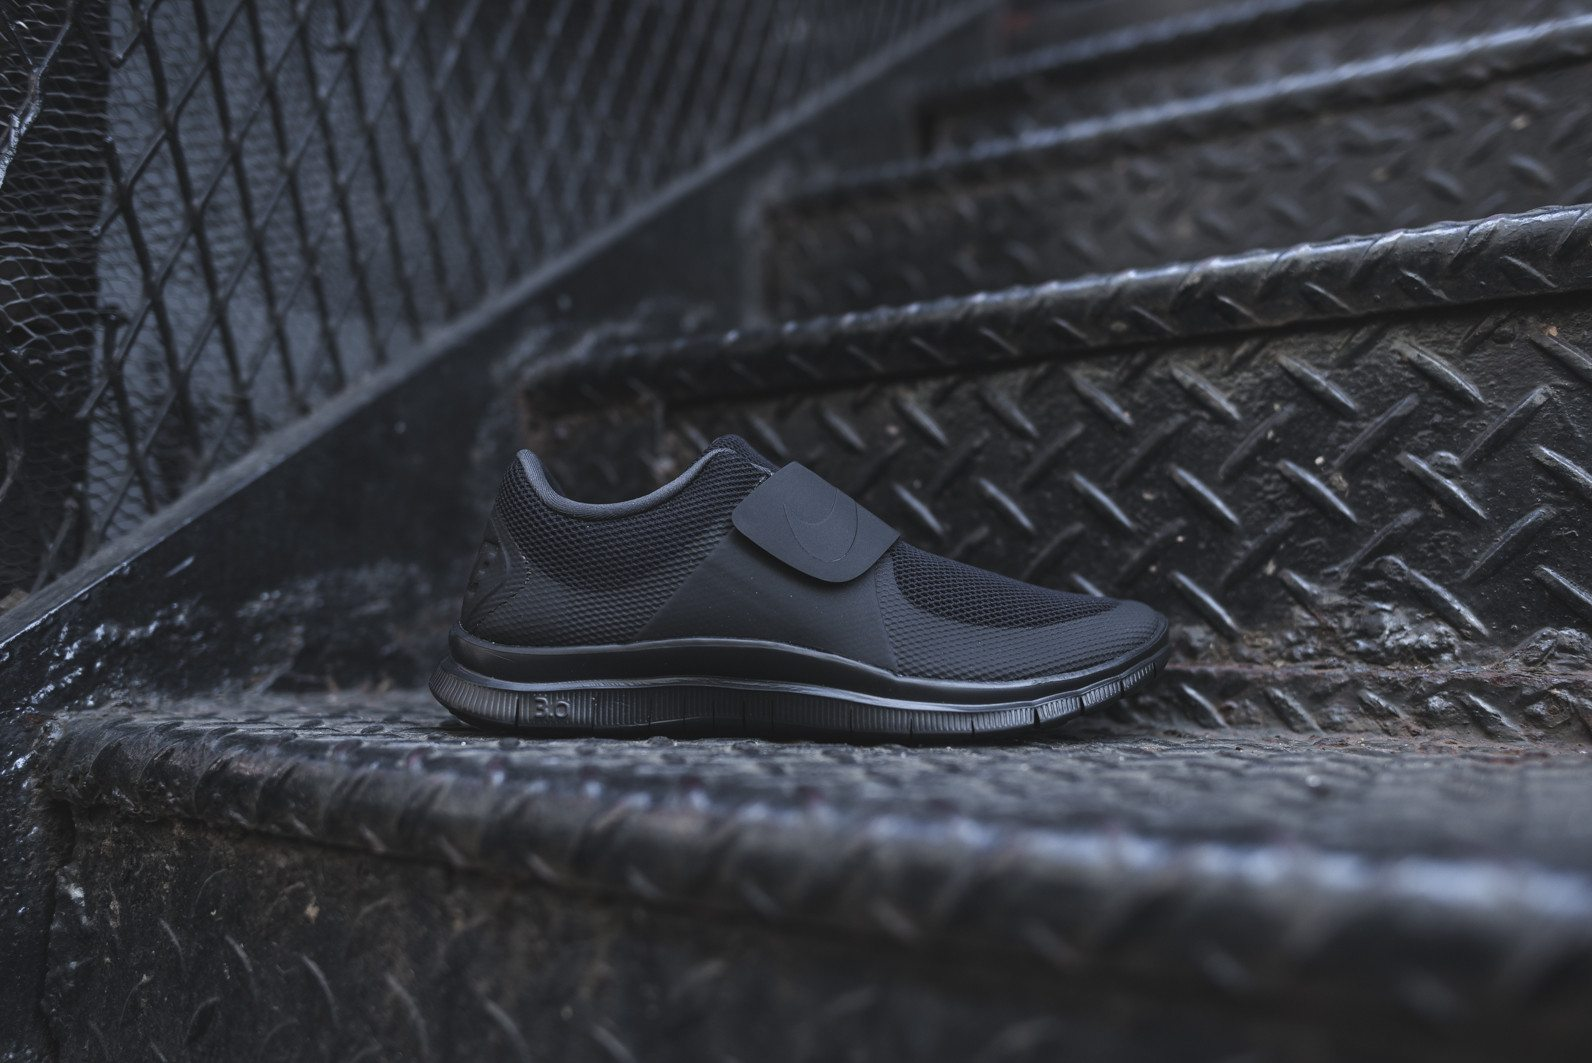 Nike Free Socfly Black Anthracite 1